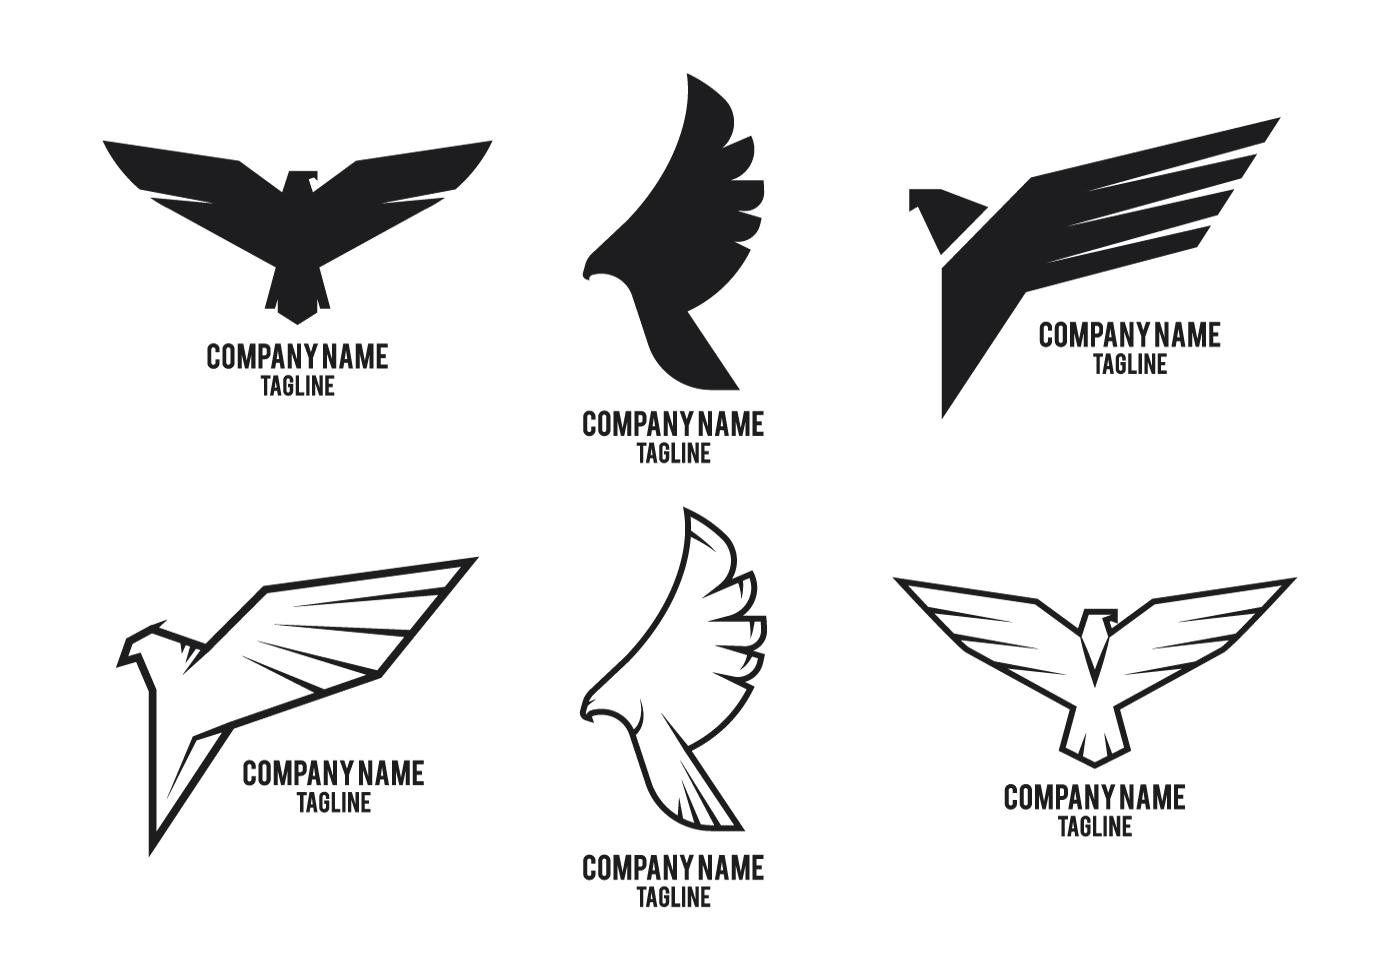 Hawk Logo Company - Download Free Vector Art, Stock ...